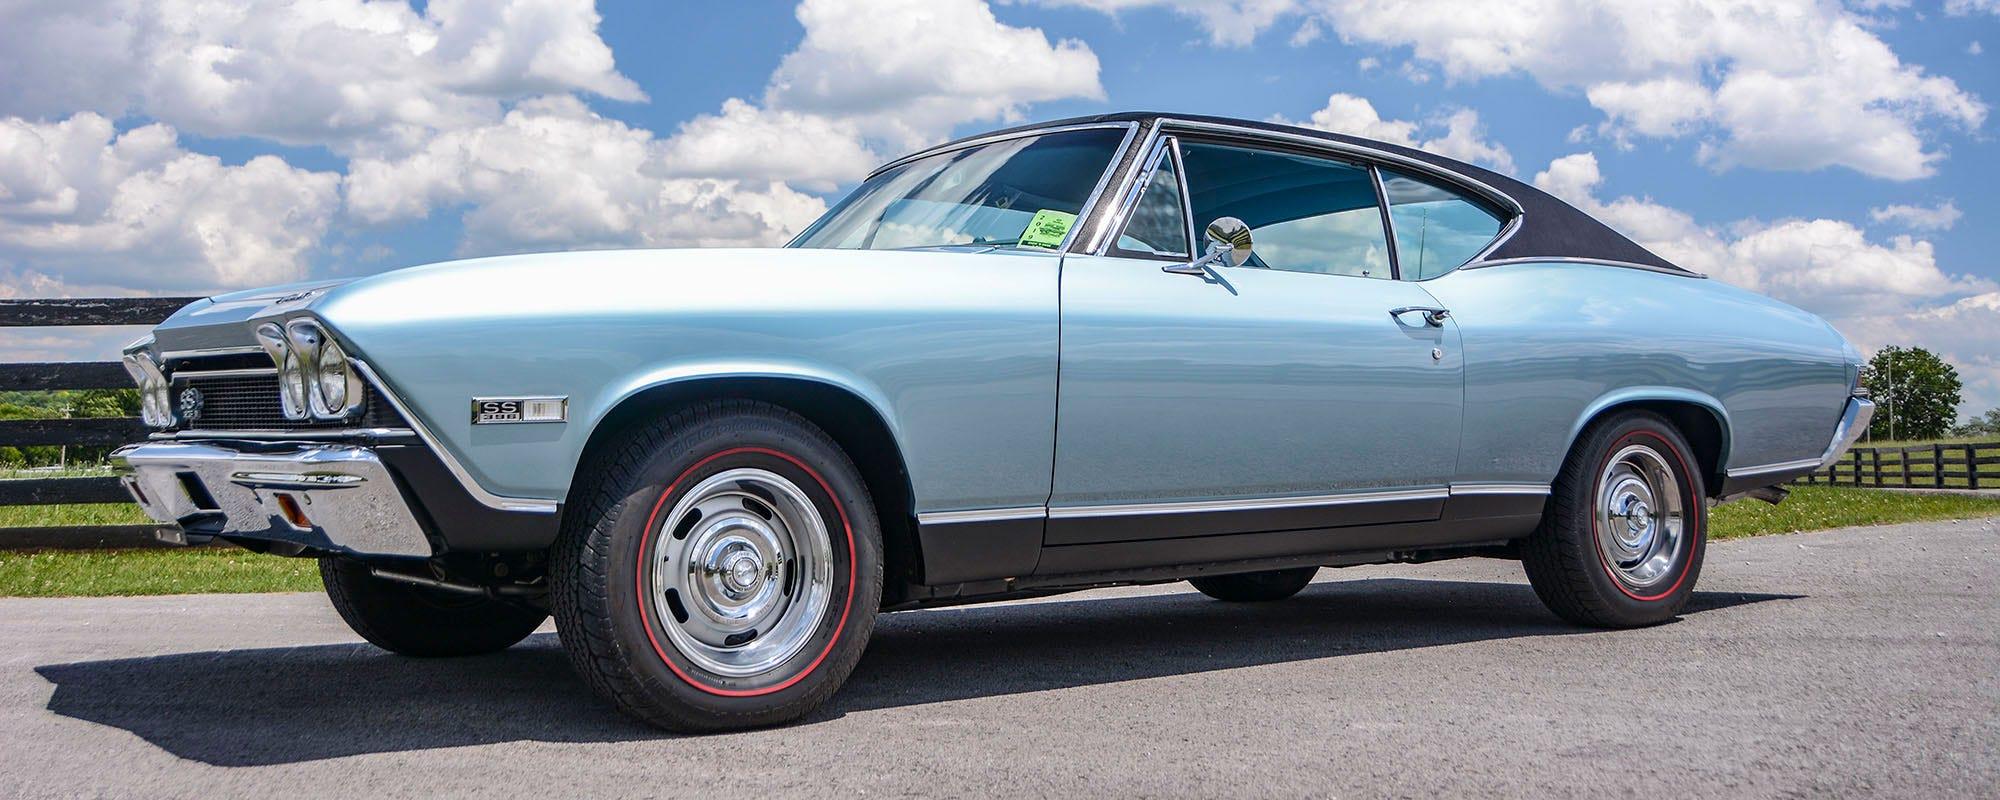 1968 Chevrolet Chevelle SS 396 with Redline BF Goodrich Silvertown Radial tires